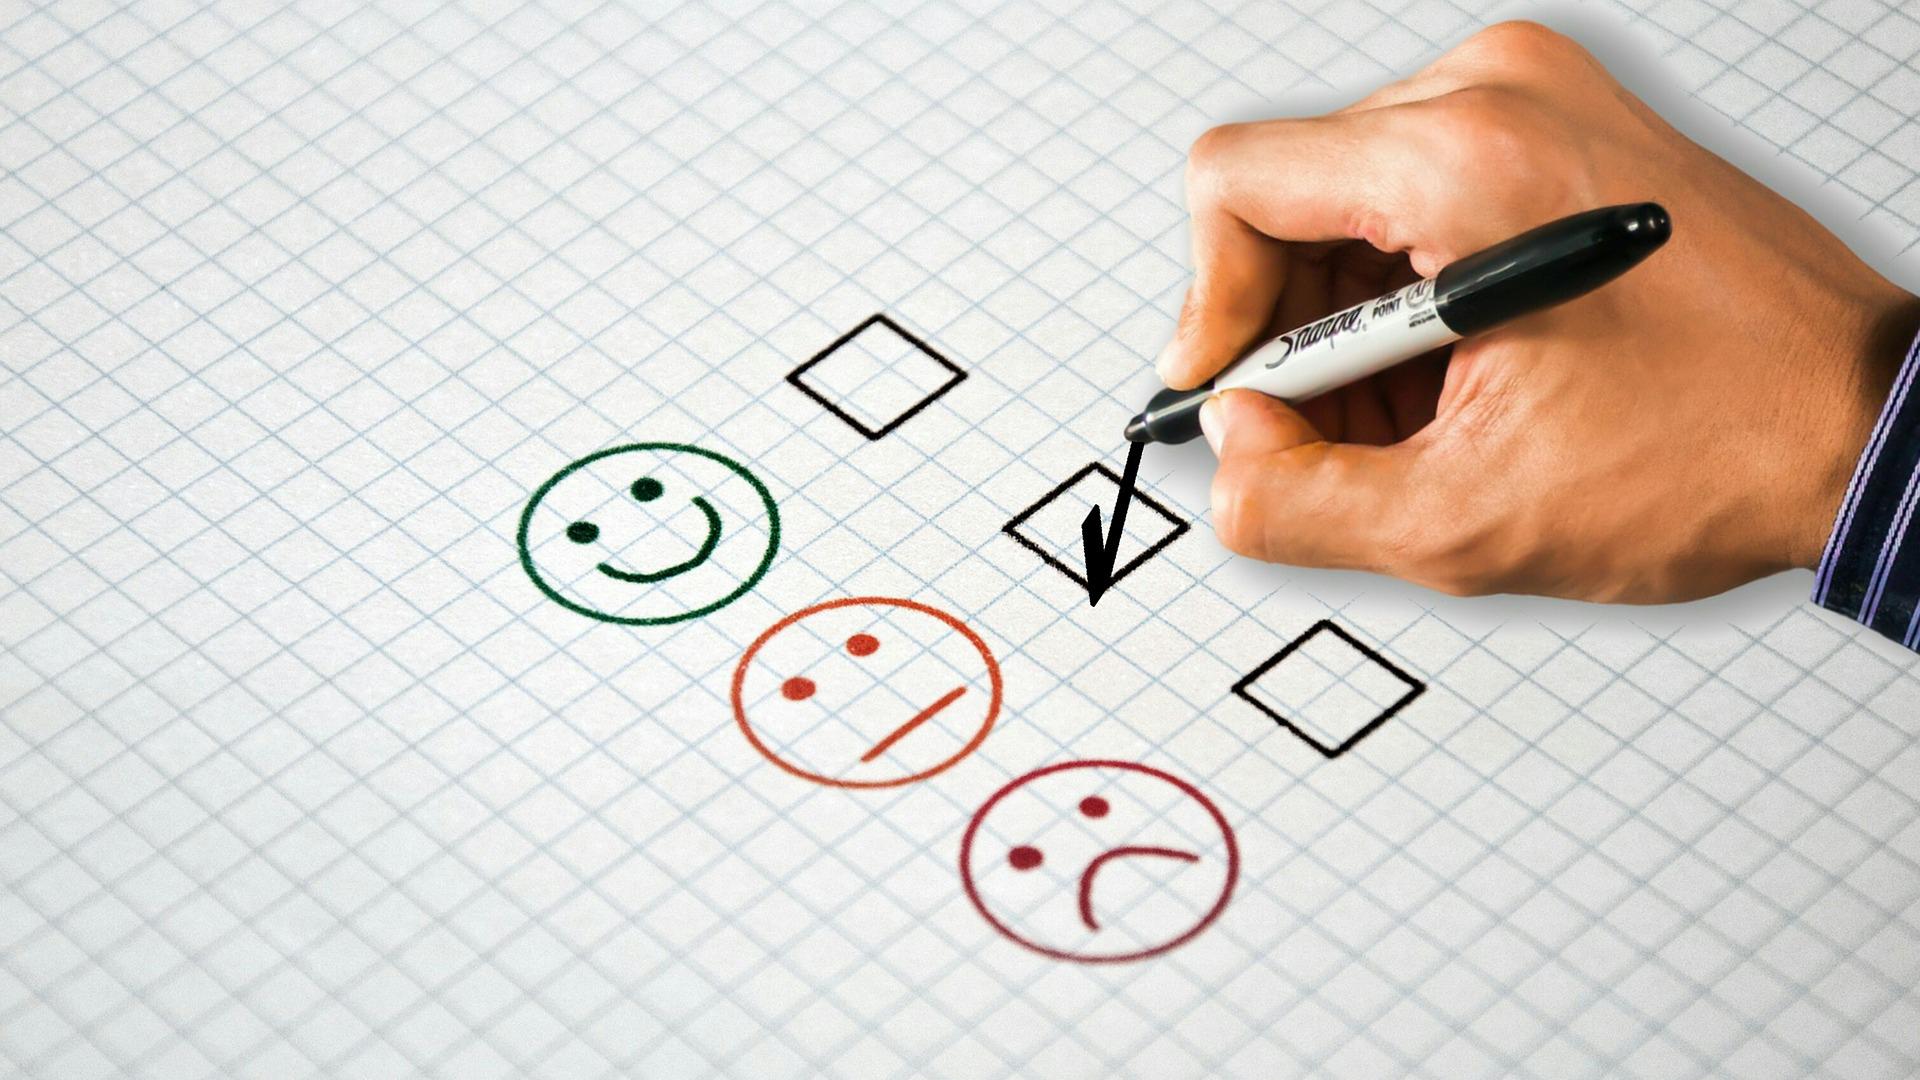 vídeo testimonial opinión feedback imagen post blog grupoaudiovisual 02